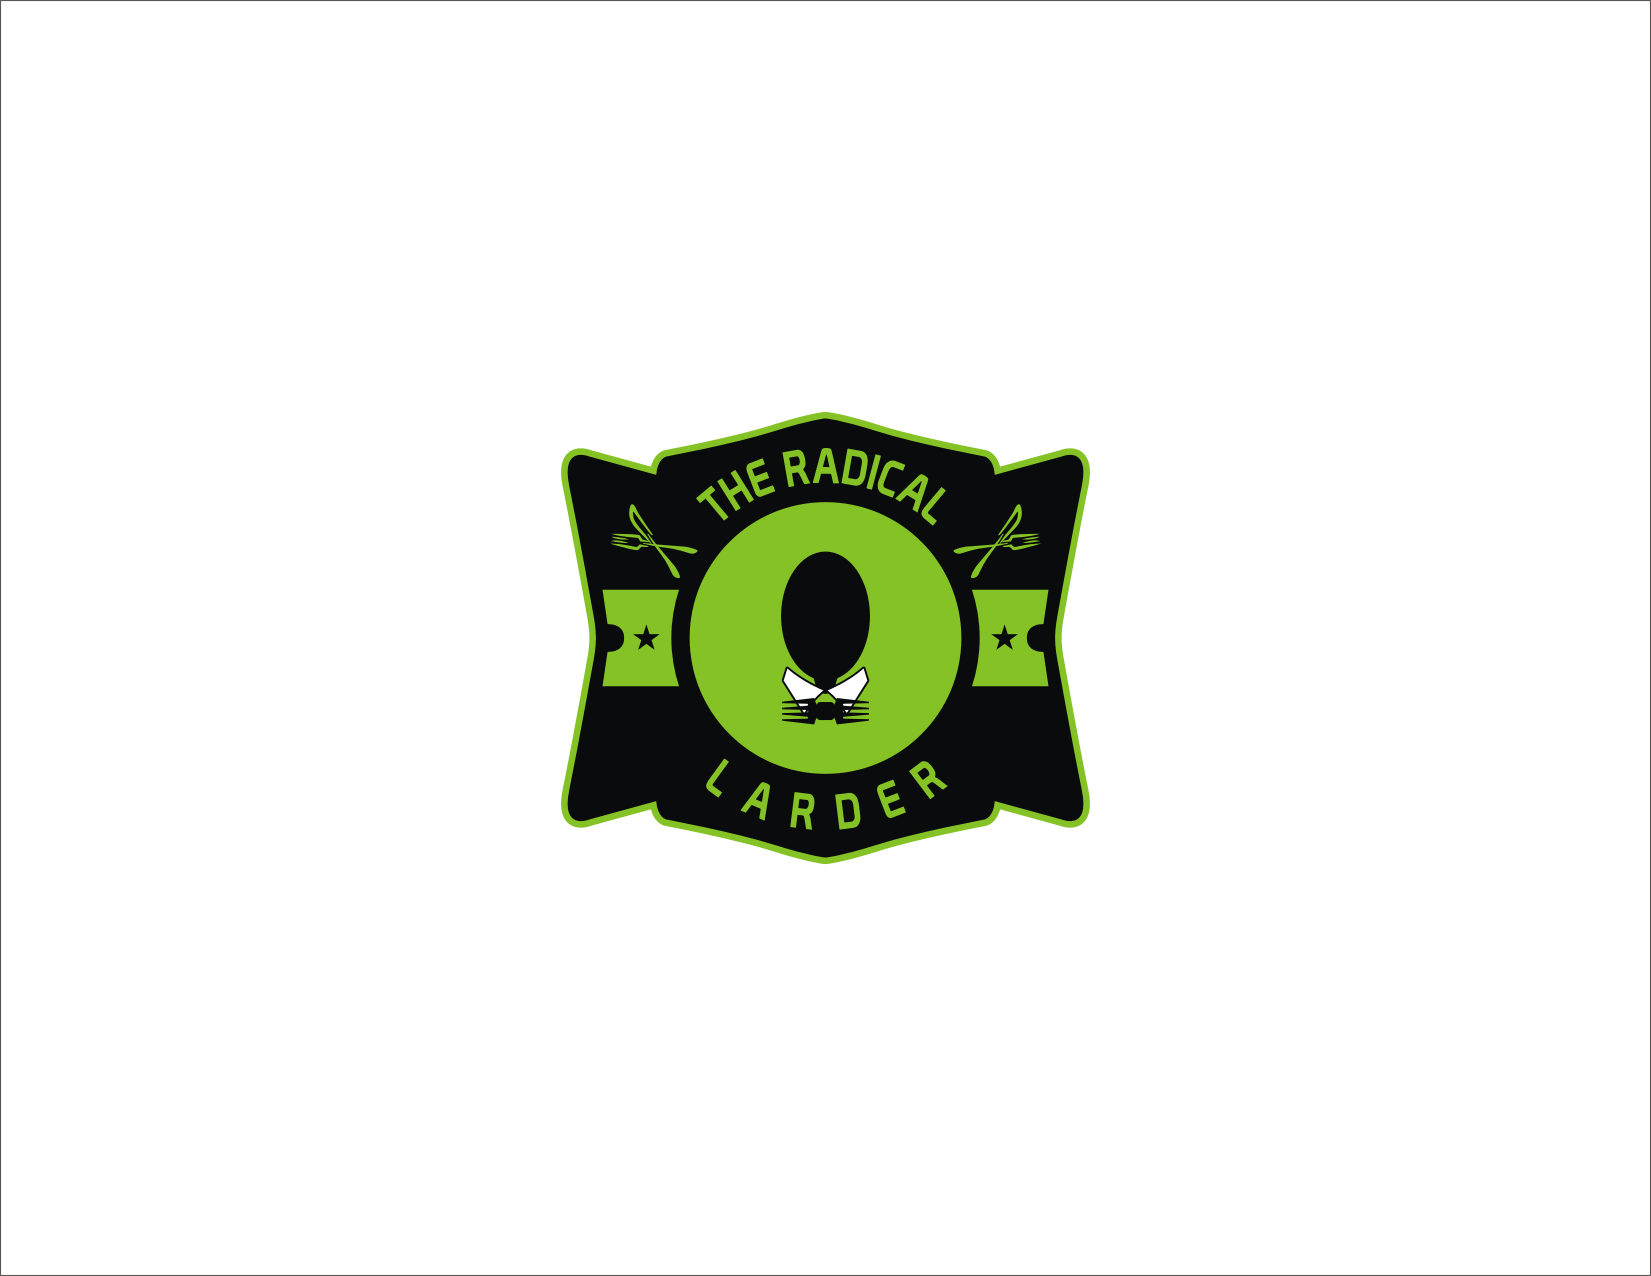 Logo Design by Donand Halilintar - Entry No. 4 in the Logo Design Contest Captivating Logo Design for The Radical Larder.